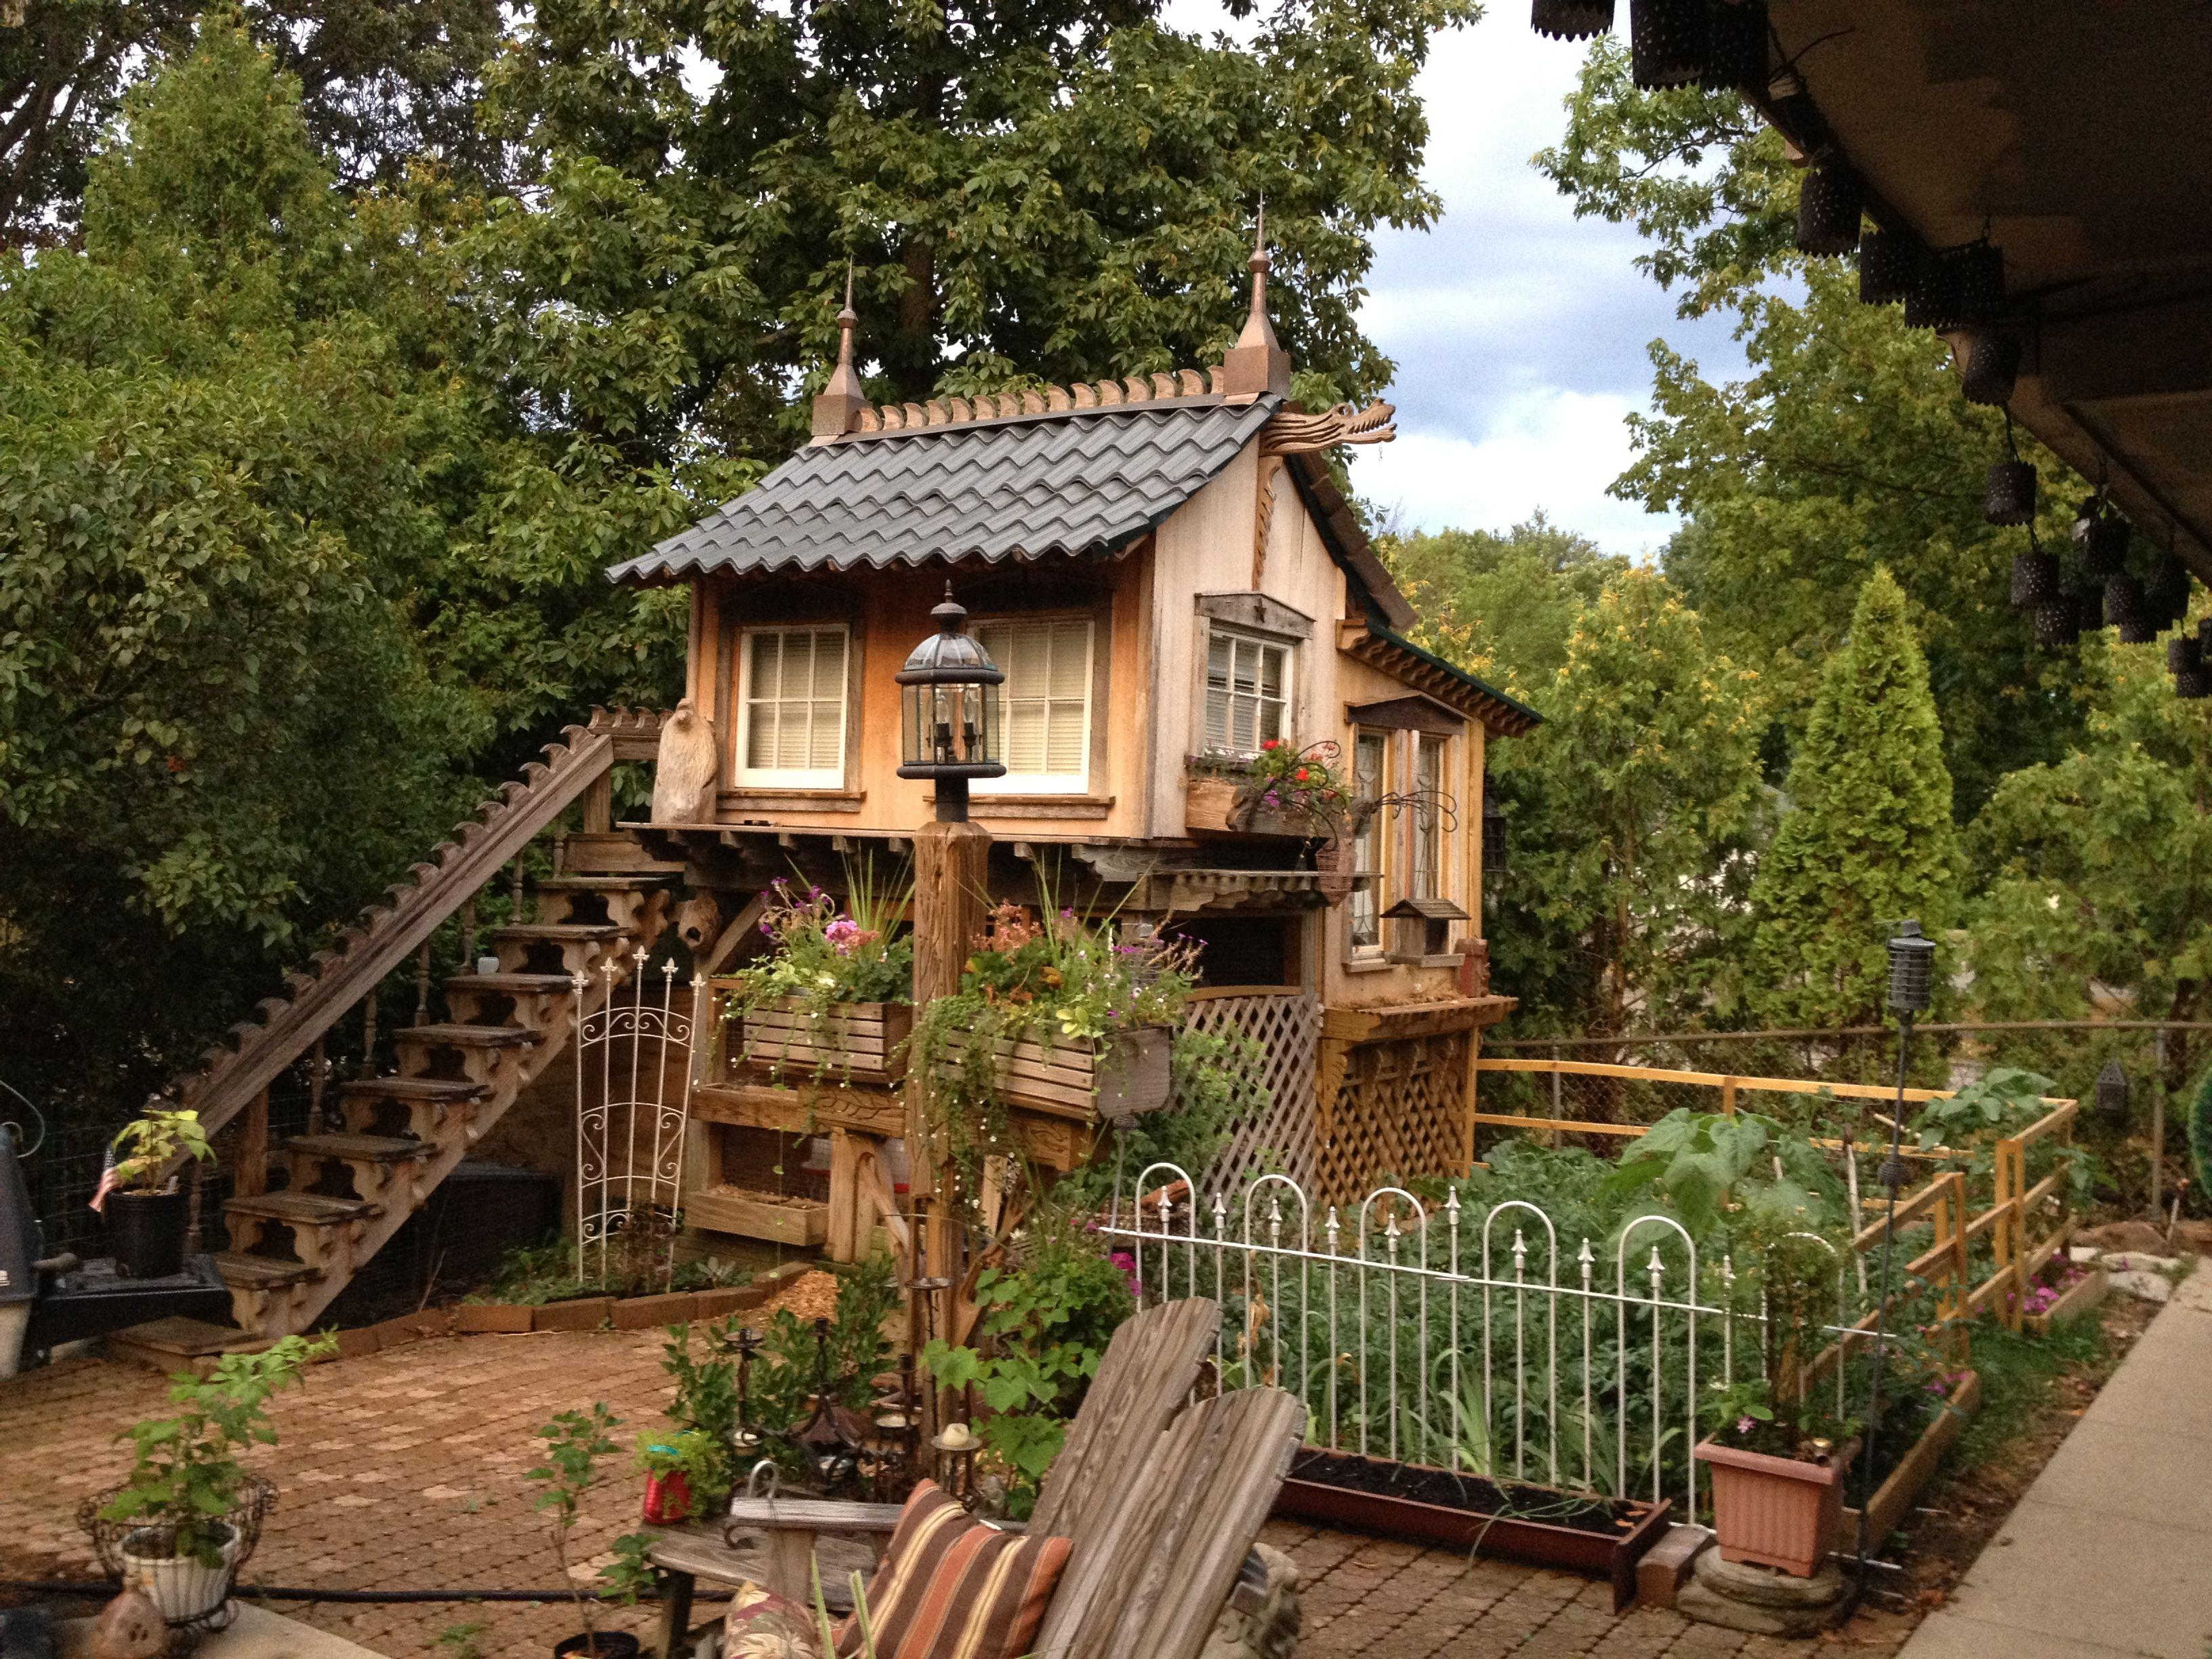 backyard retreat built by Mark Phenicie | garden retreats ... on Backyard Retreat Ideas id=16549